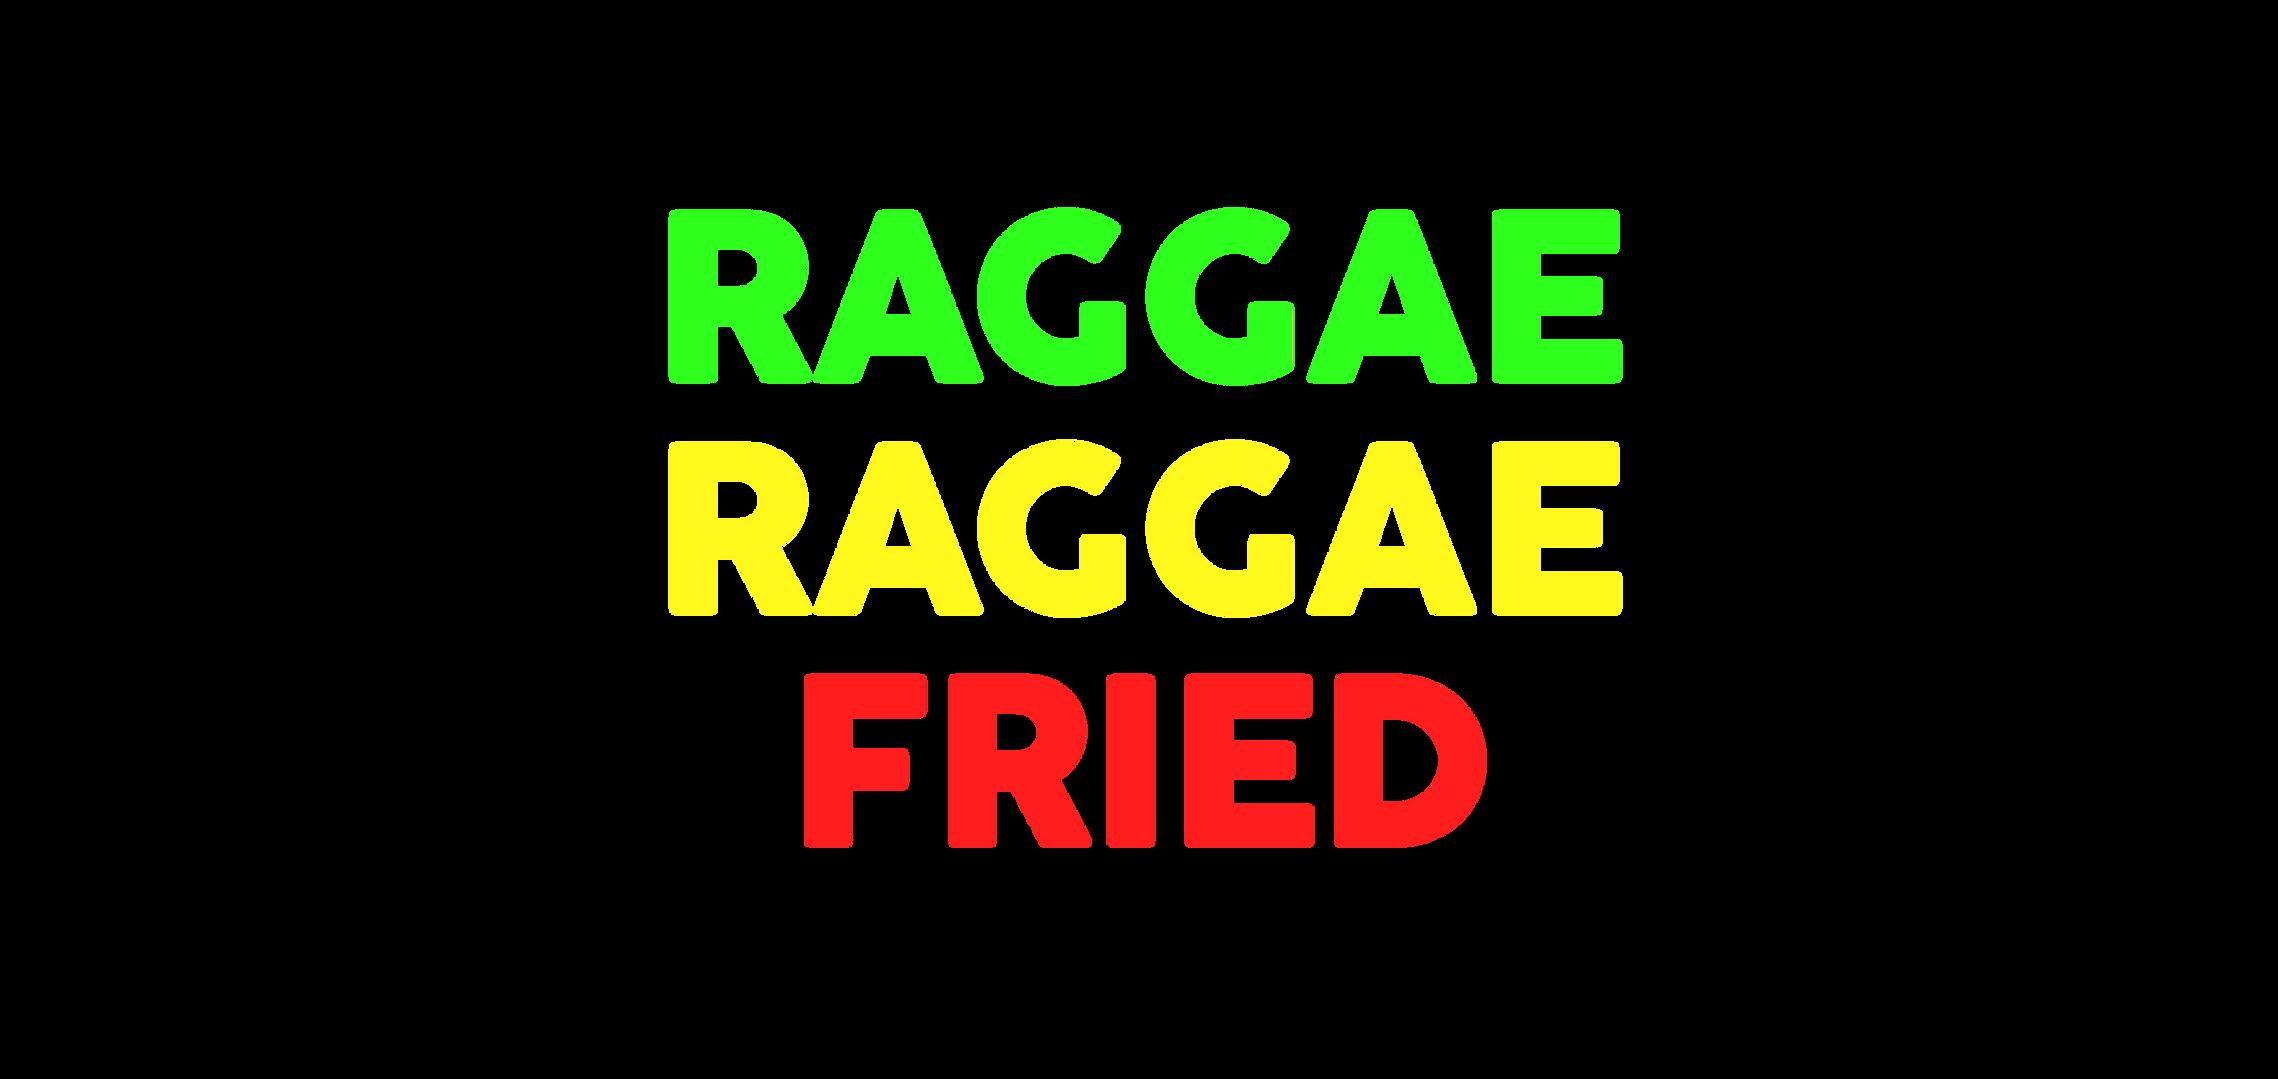 Raggae Raggae Sauce.png